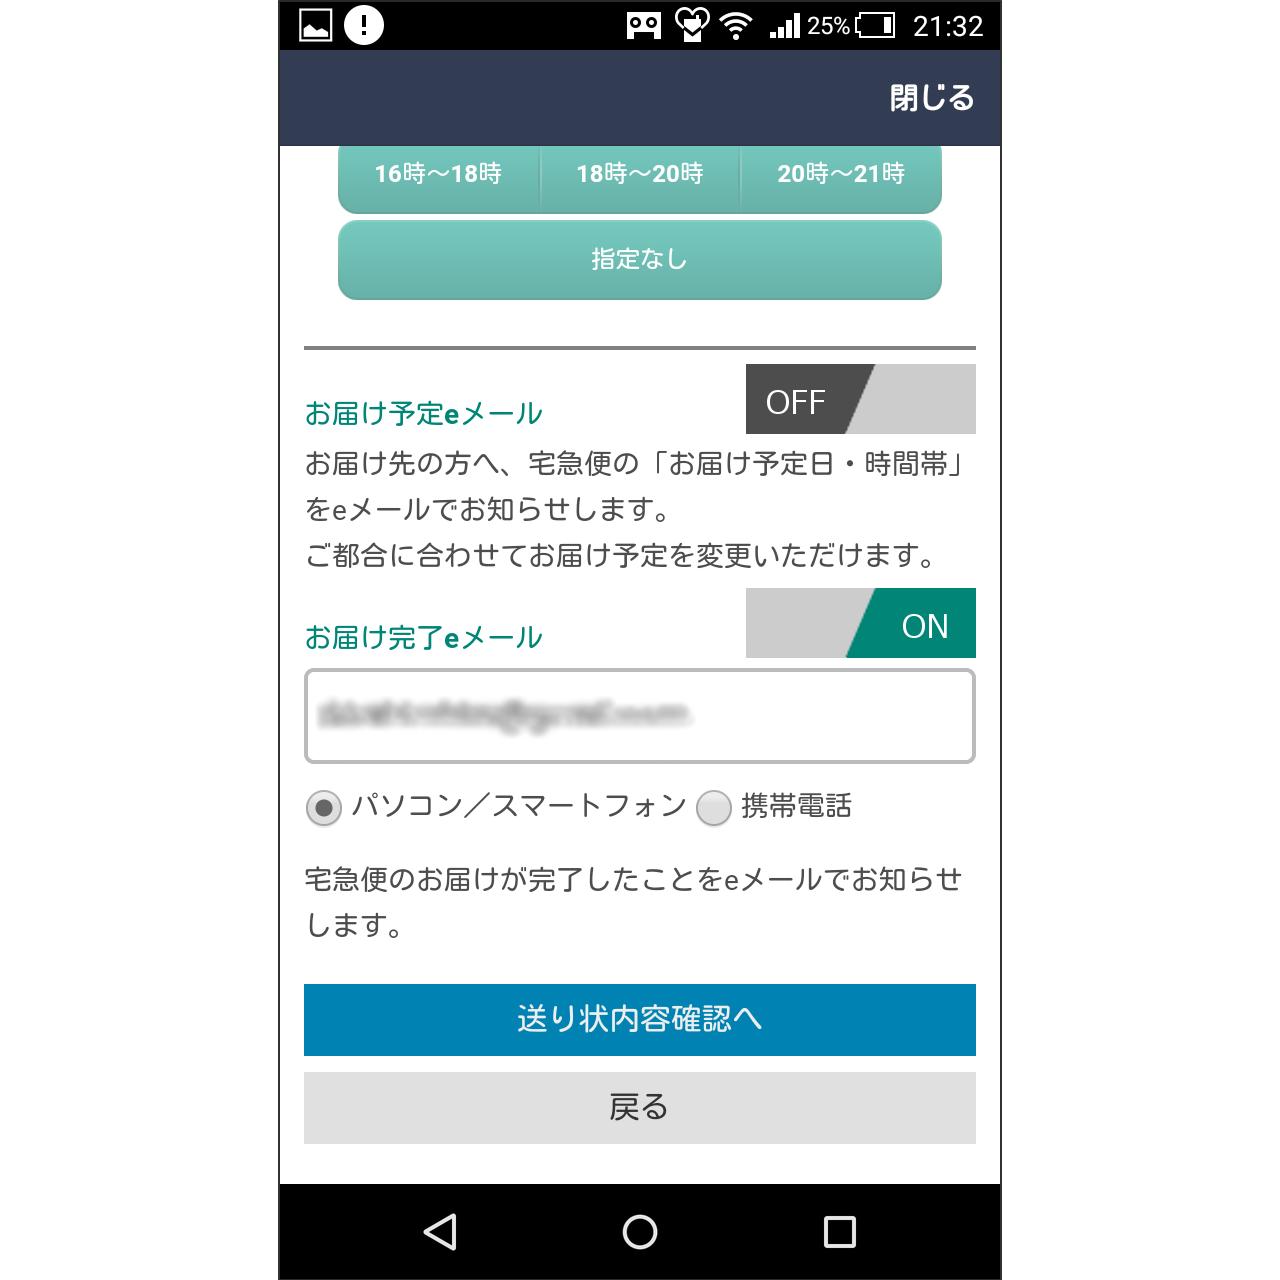 screenshot_2016-09-09-21-32-34